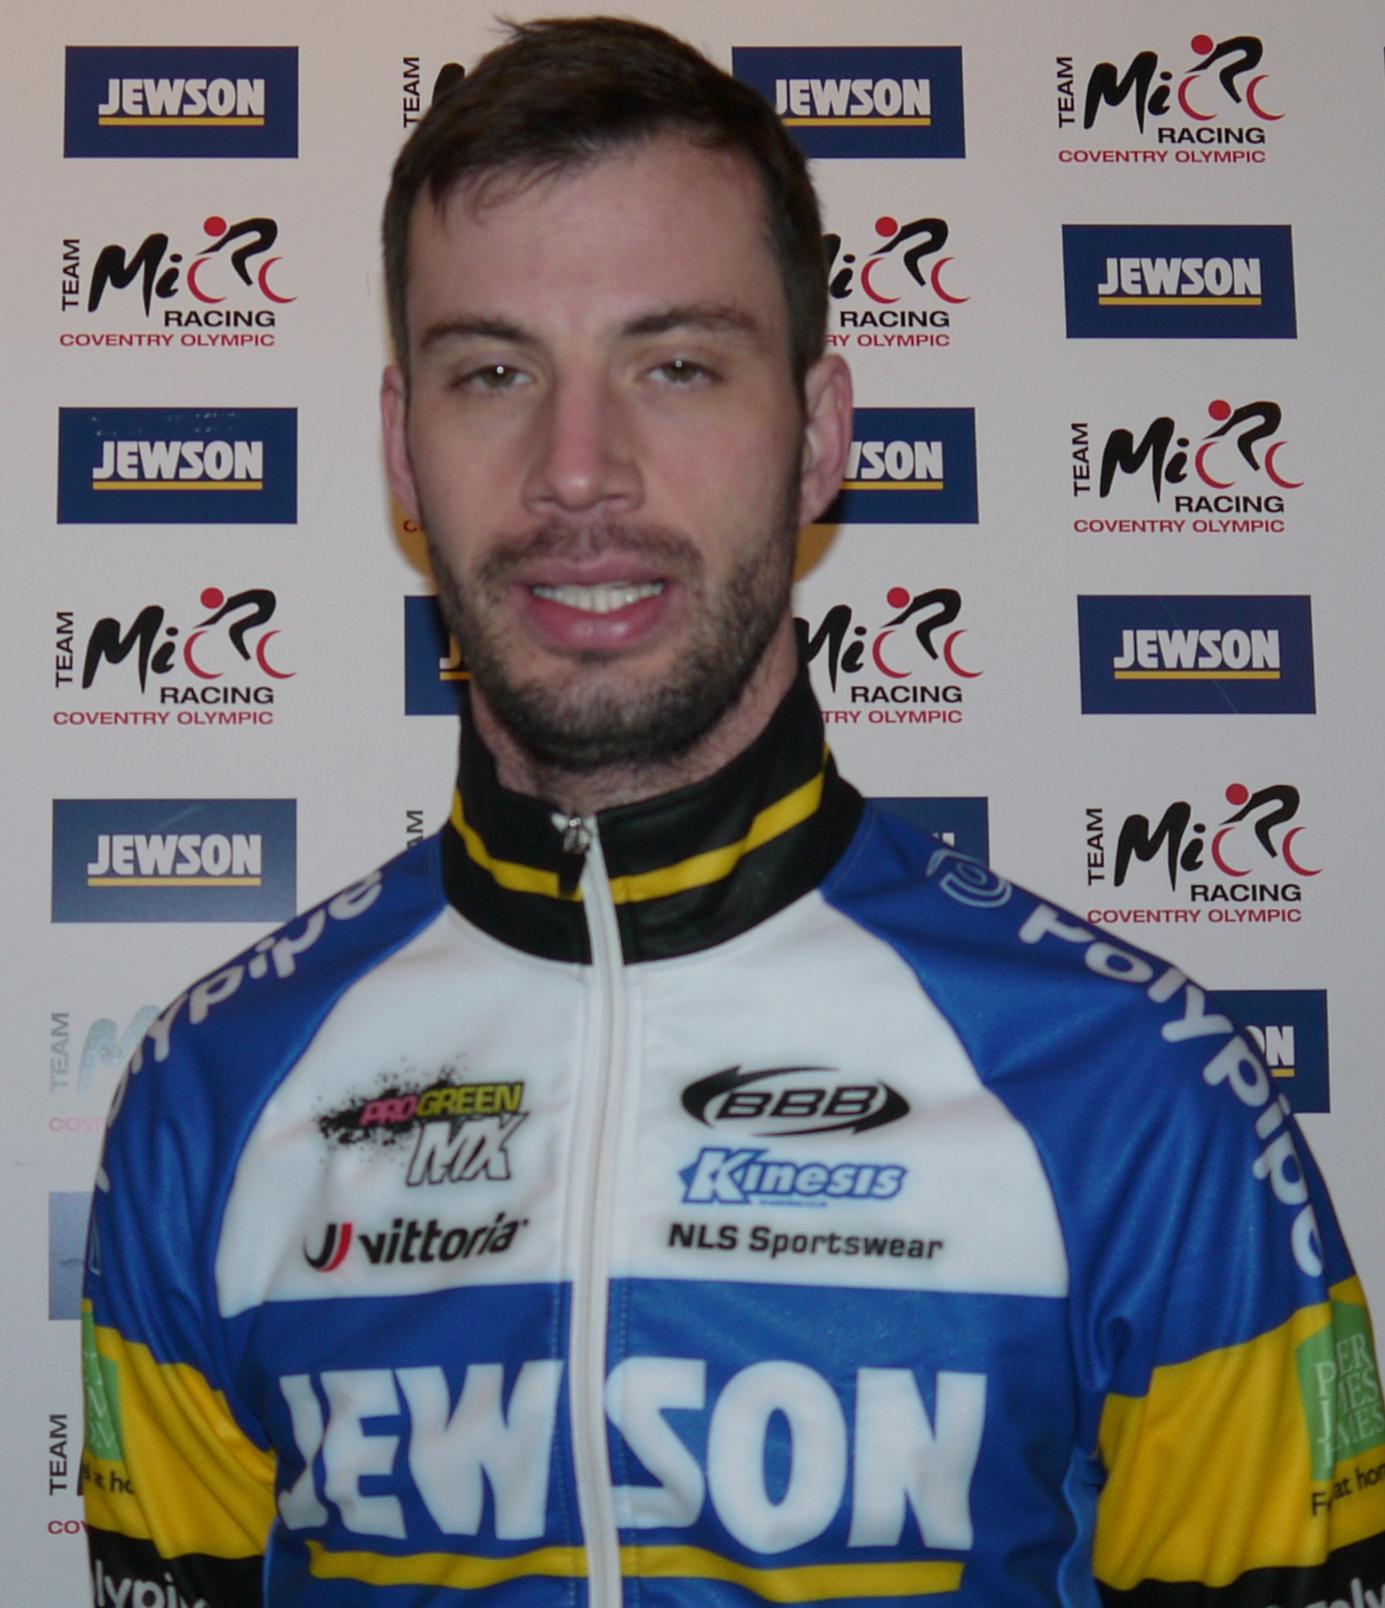 Matt CLin